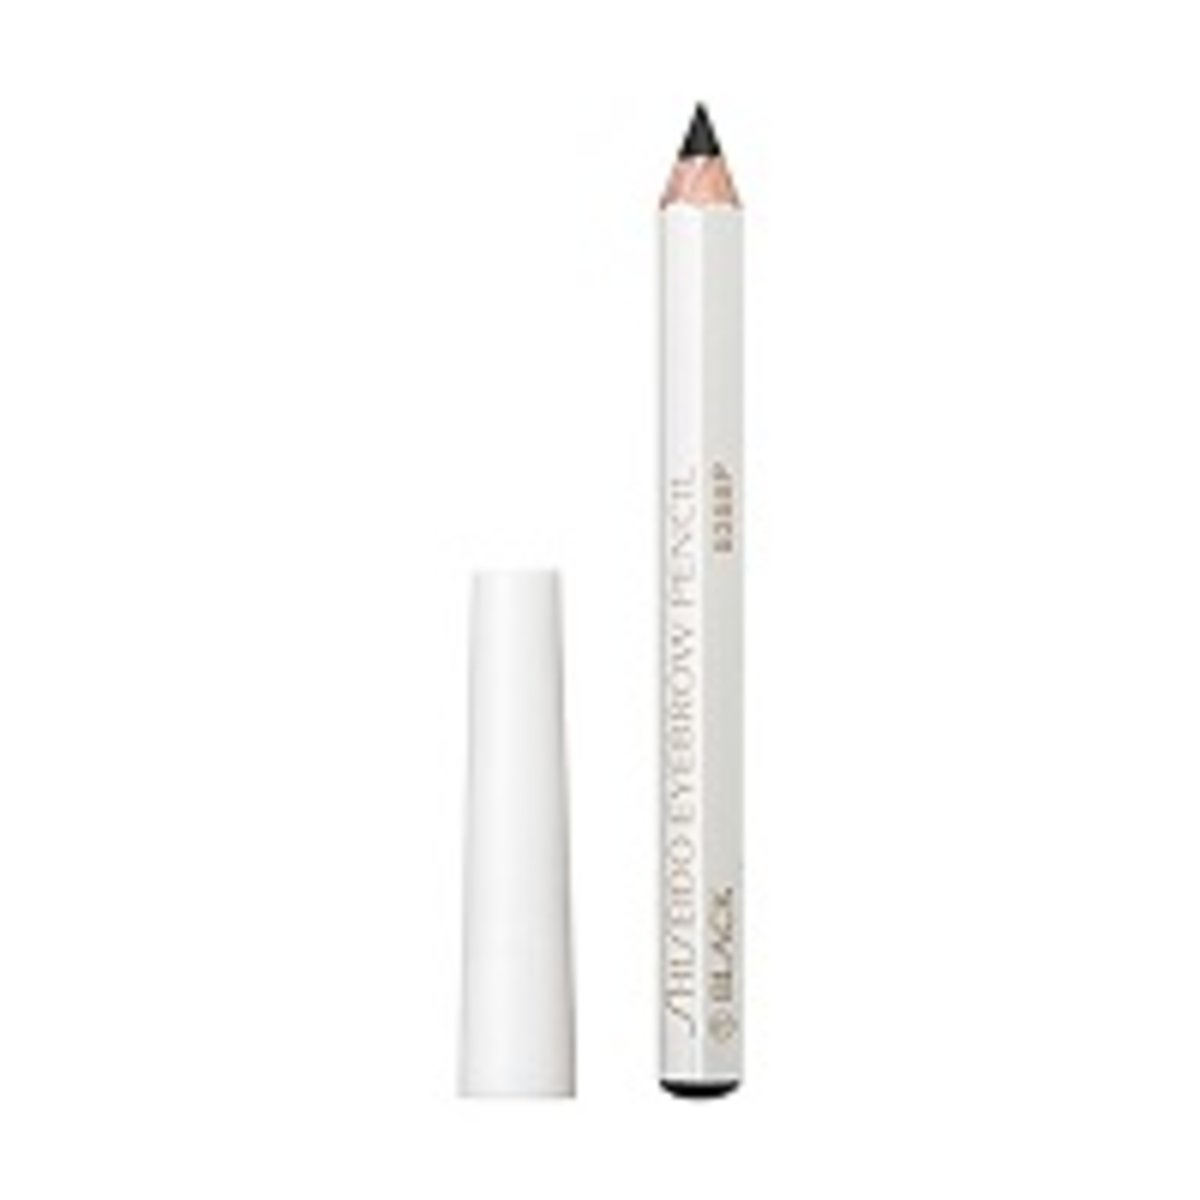 Japan Shiseido Eyebrow Pencil-Black color  #1 (Parallel import)